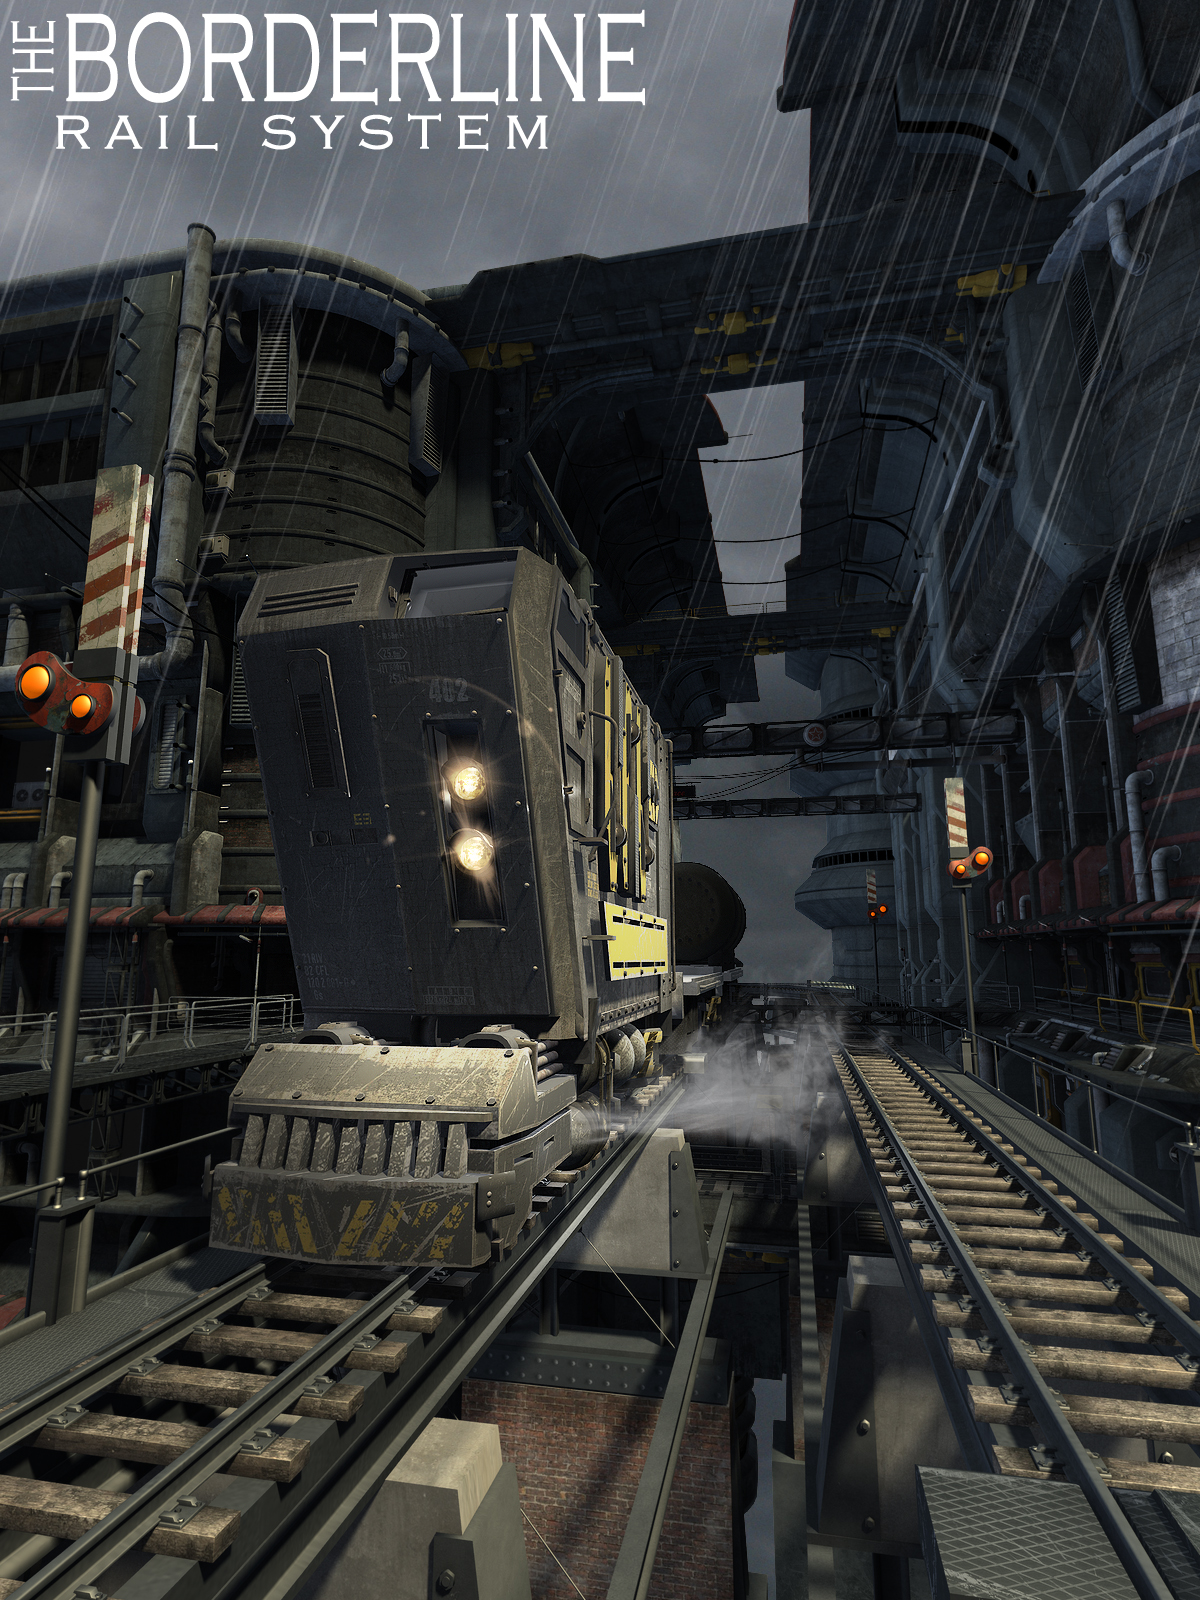 The BorderLine by: The AntFarm, 3D Models by Daz 3D